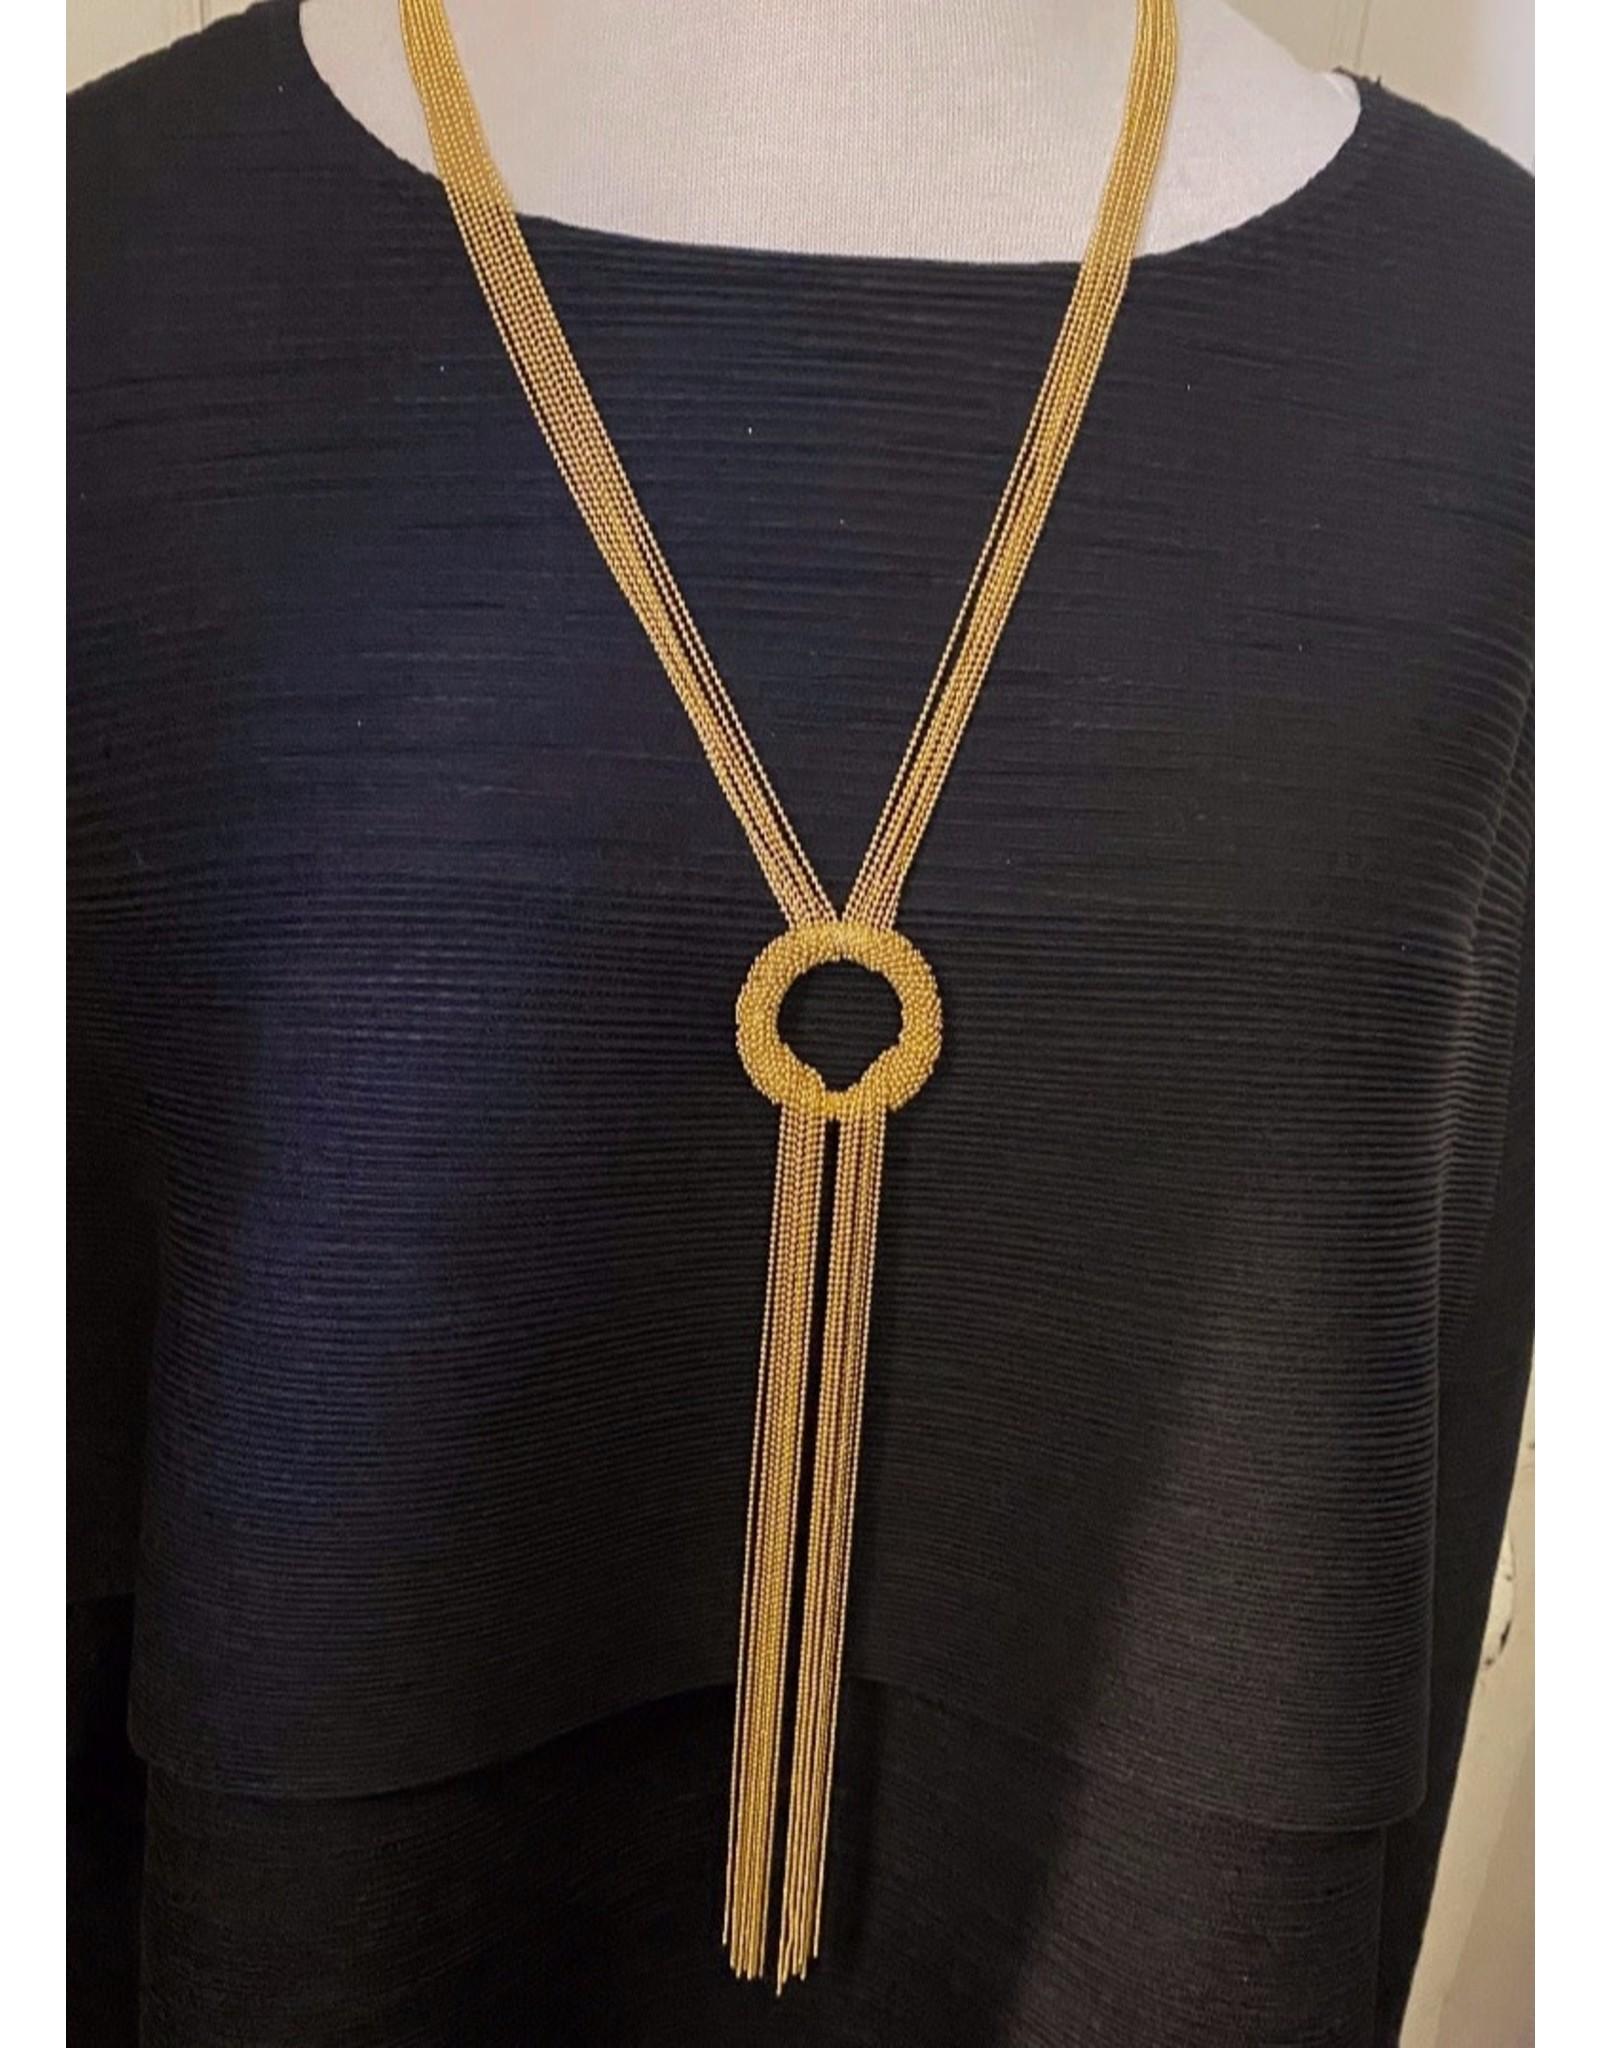 Karin Sultan Gold Tassel Circle Long Necklace